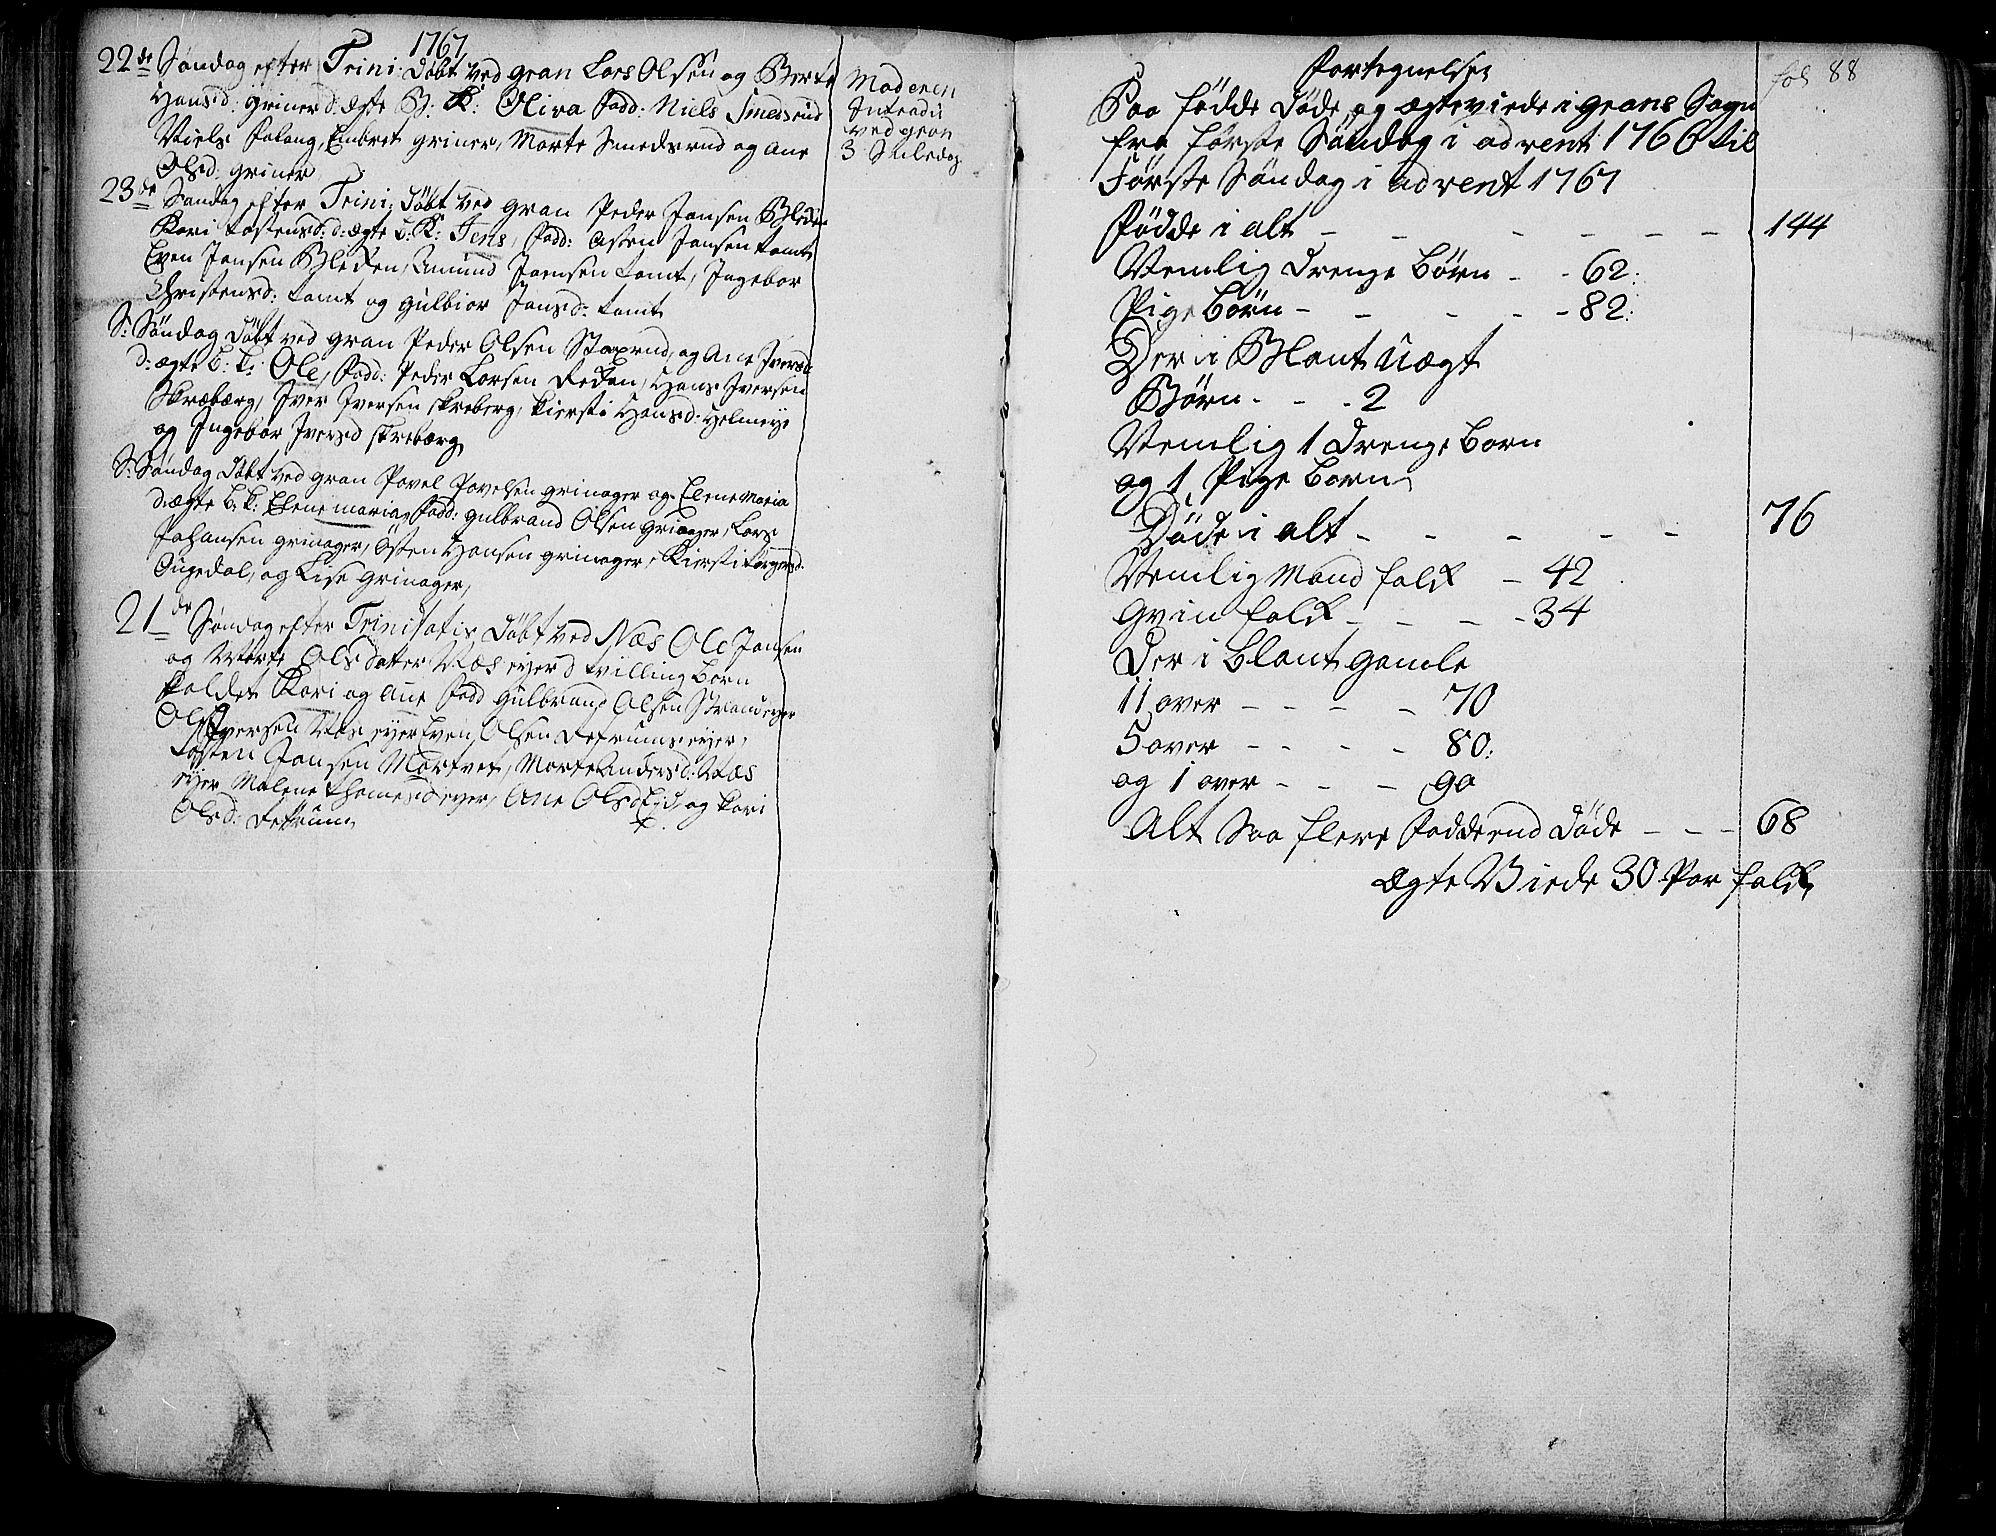 SAH, Gran prestekontor, Ministerialbok nr. 4, 1759-1775, s. 88